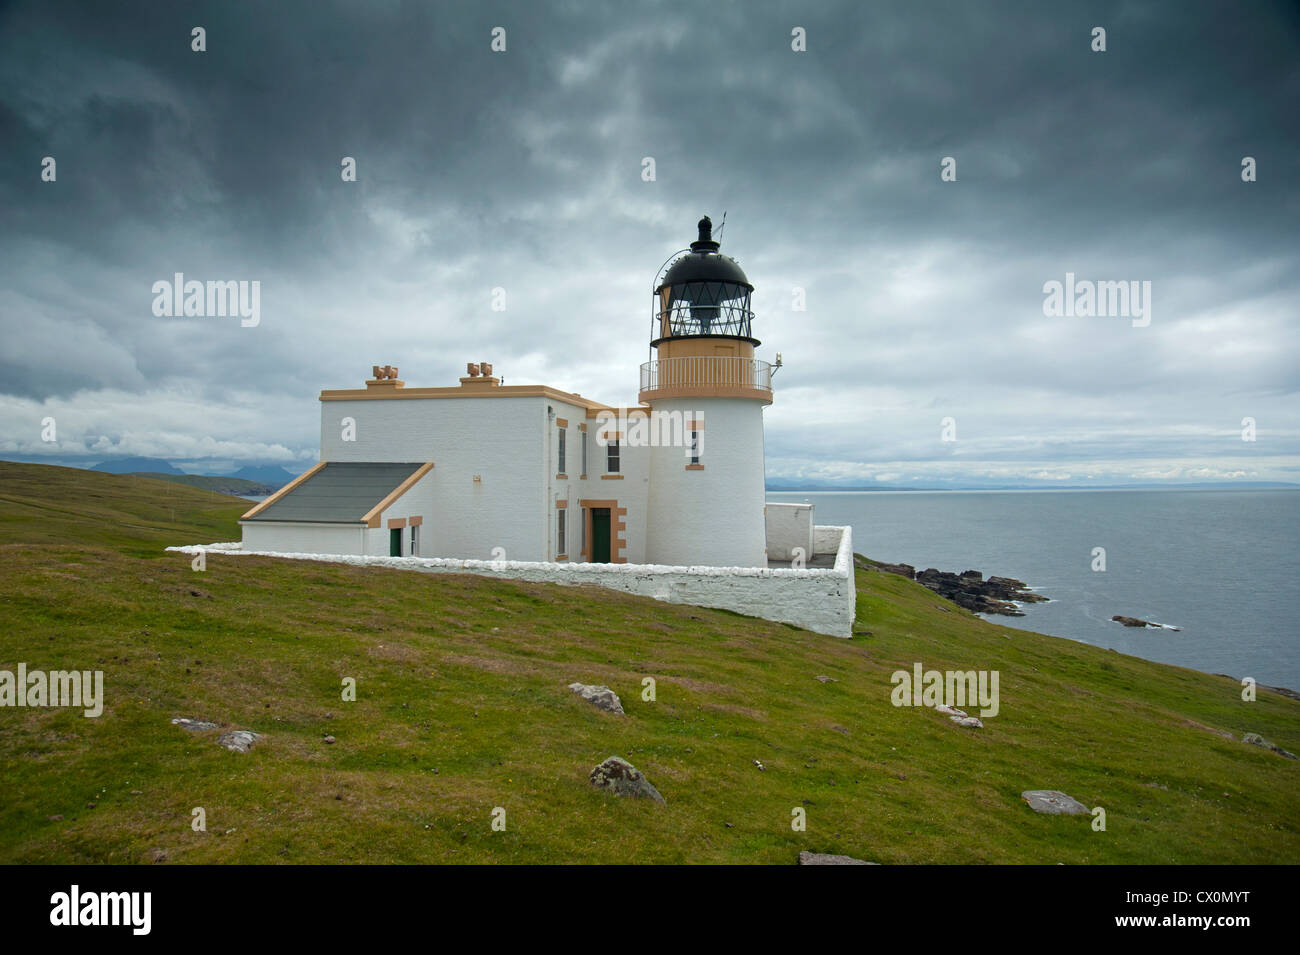 Stoer Head Lighthouse, Clashmore. Raffin. Sutherland, Scotland.  SCO 8394 - Stock Image